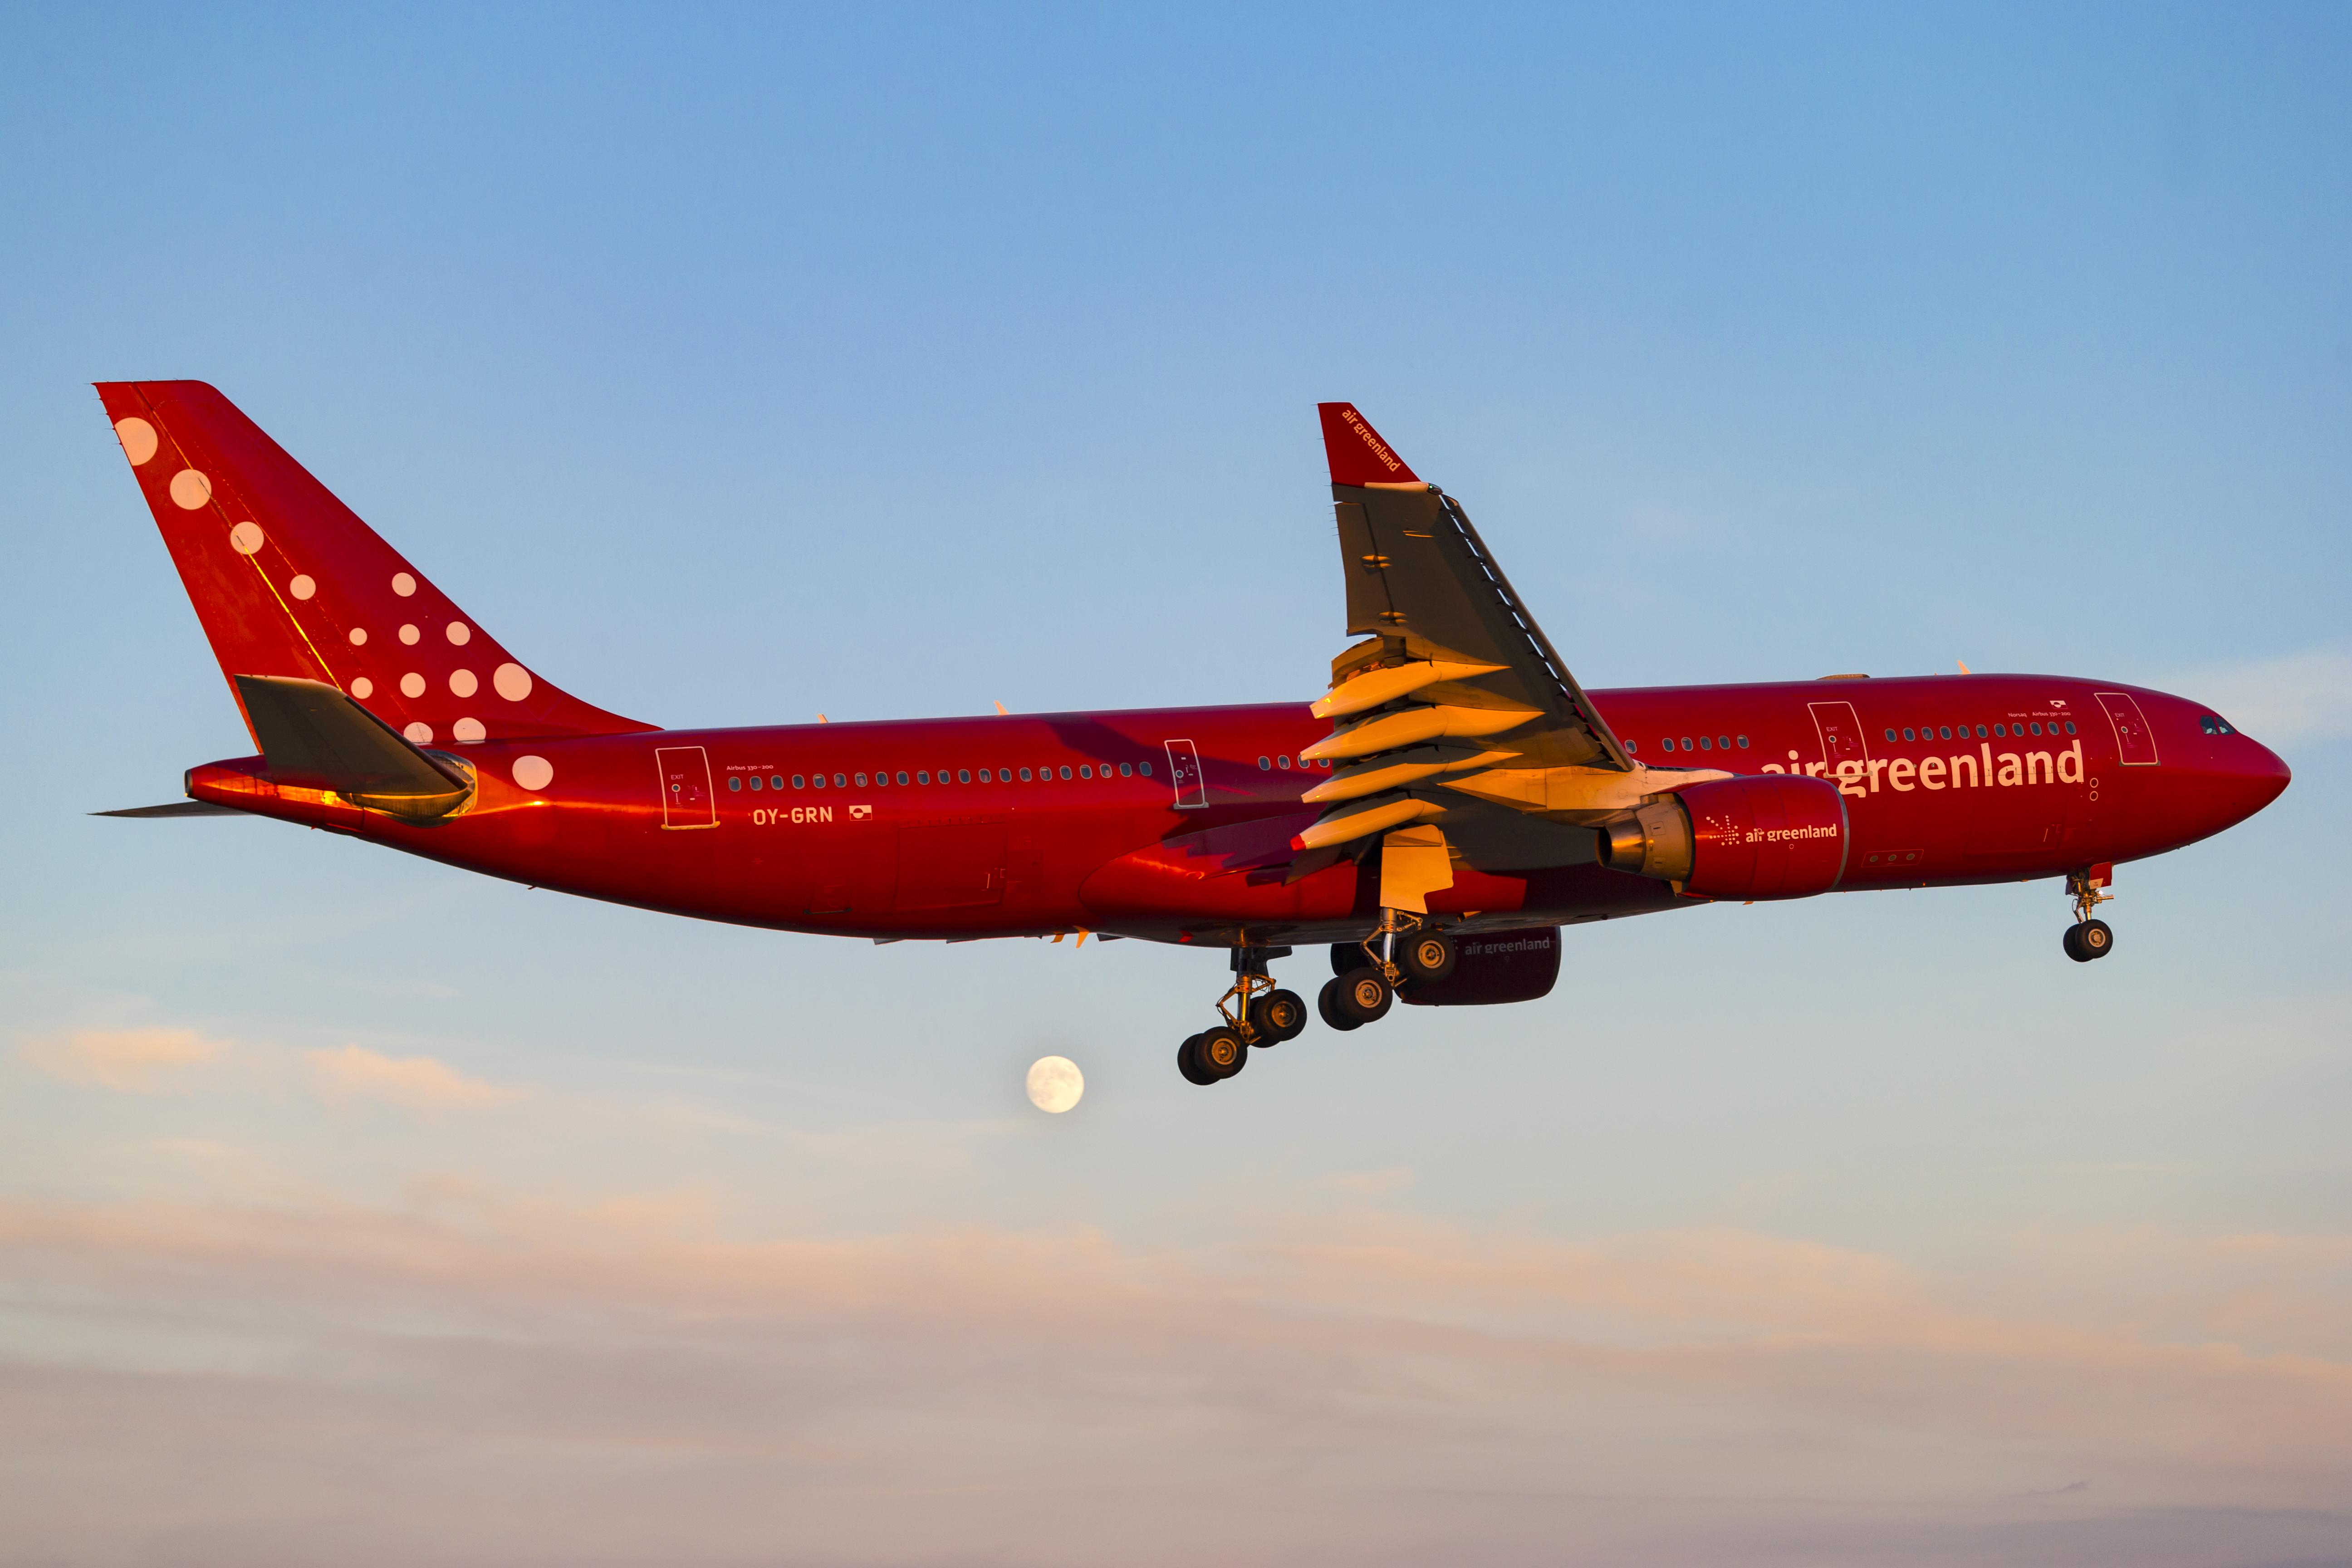 En Airbus A330-200 fra Air Greenland. Foto: © Thorbjørn Brunander Sund, Danish Aviation Photo